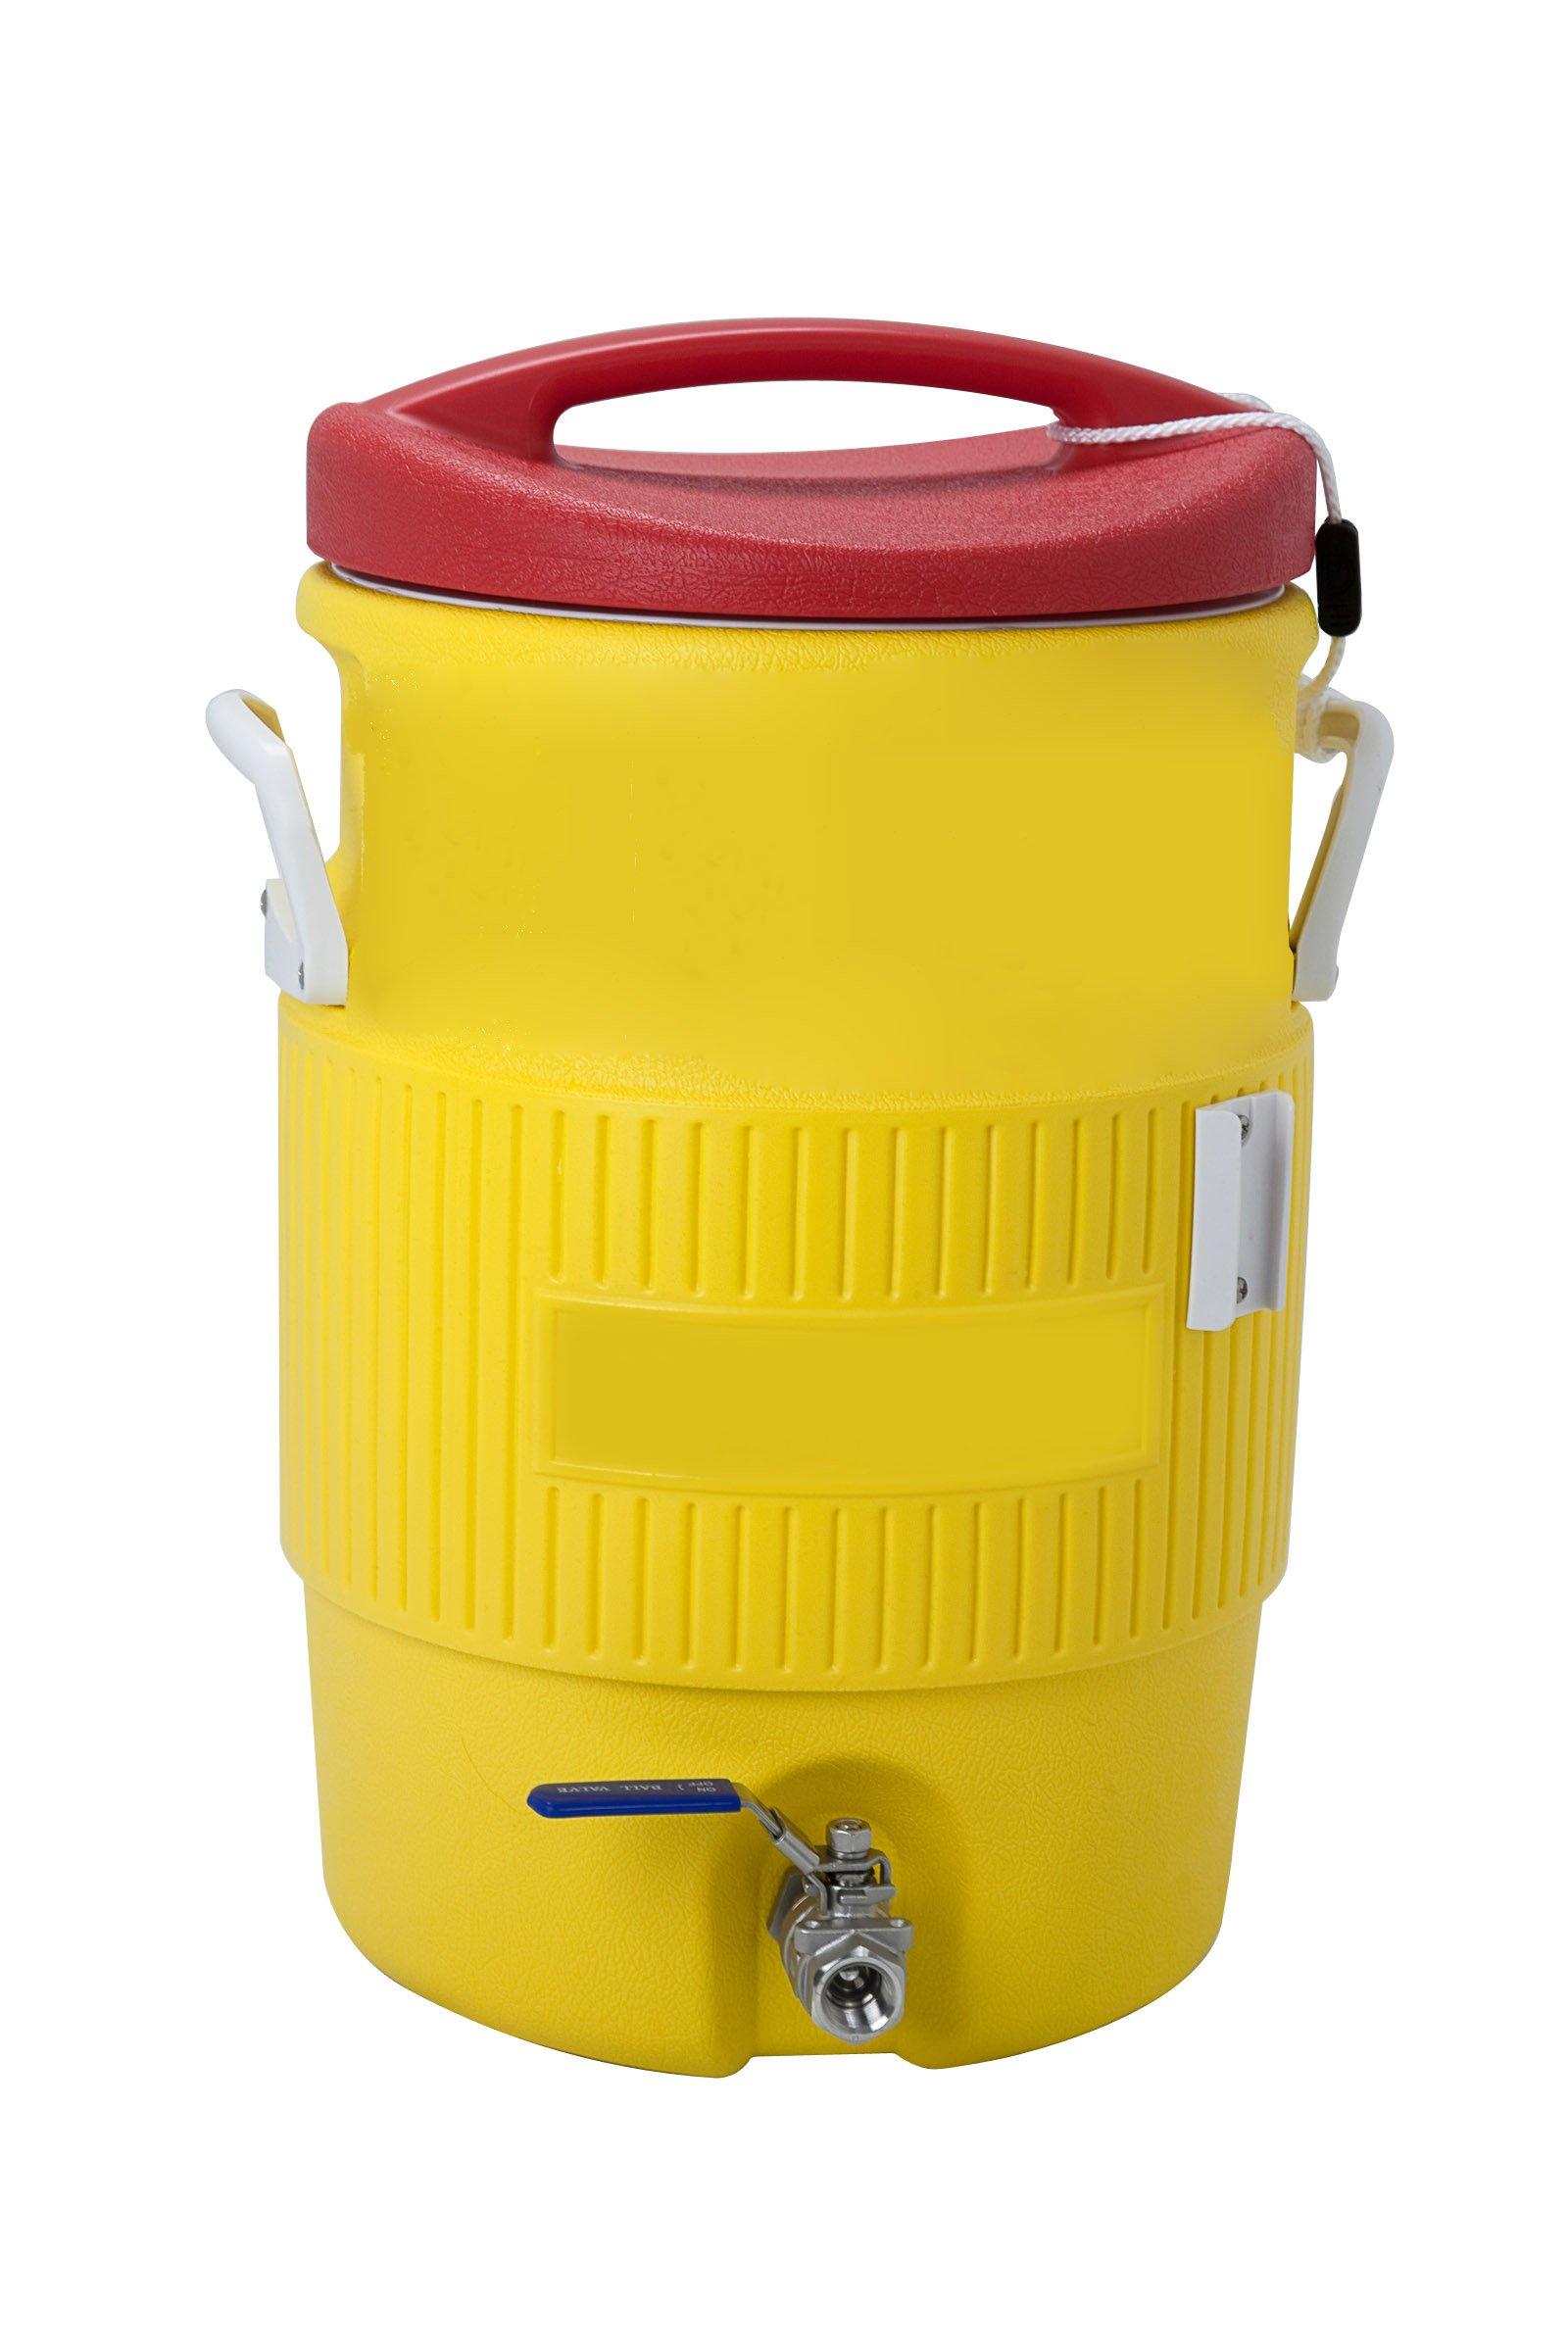 Polar Ware 4102MLT 10-Gallon Round Cooler, Yelloiw